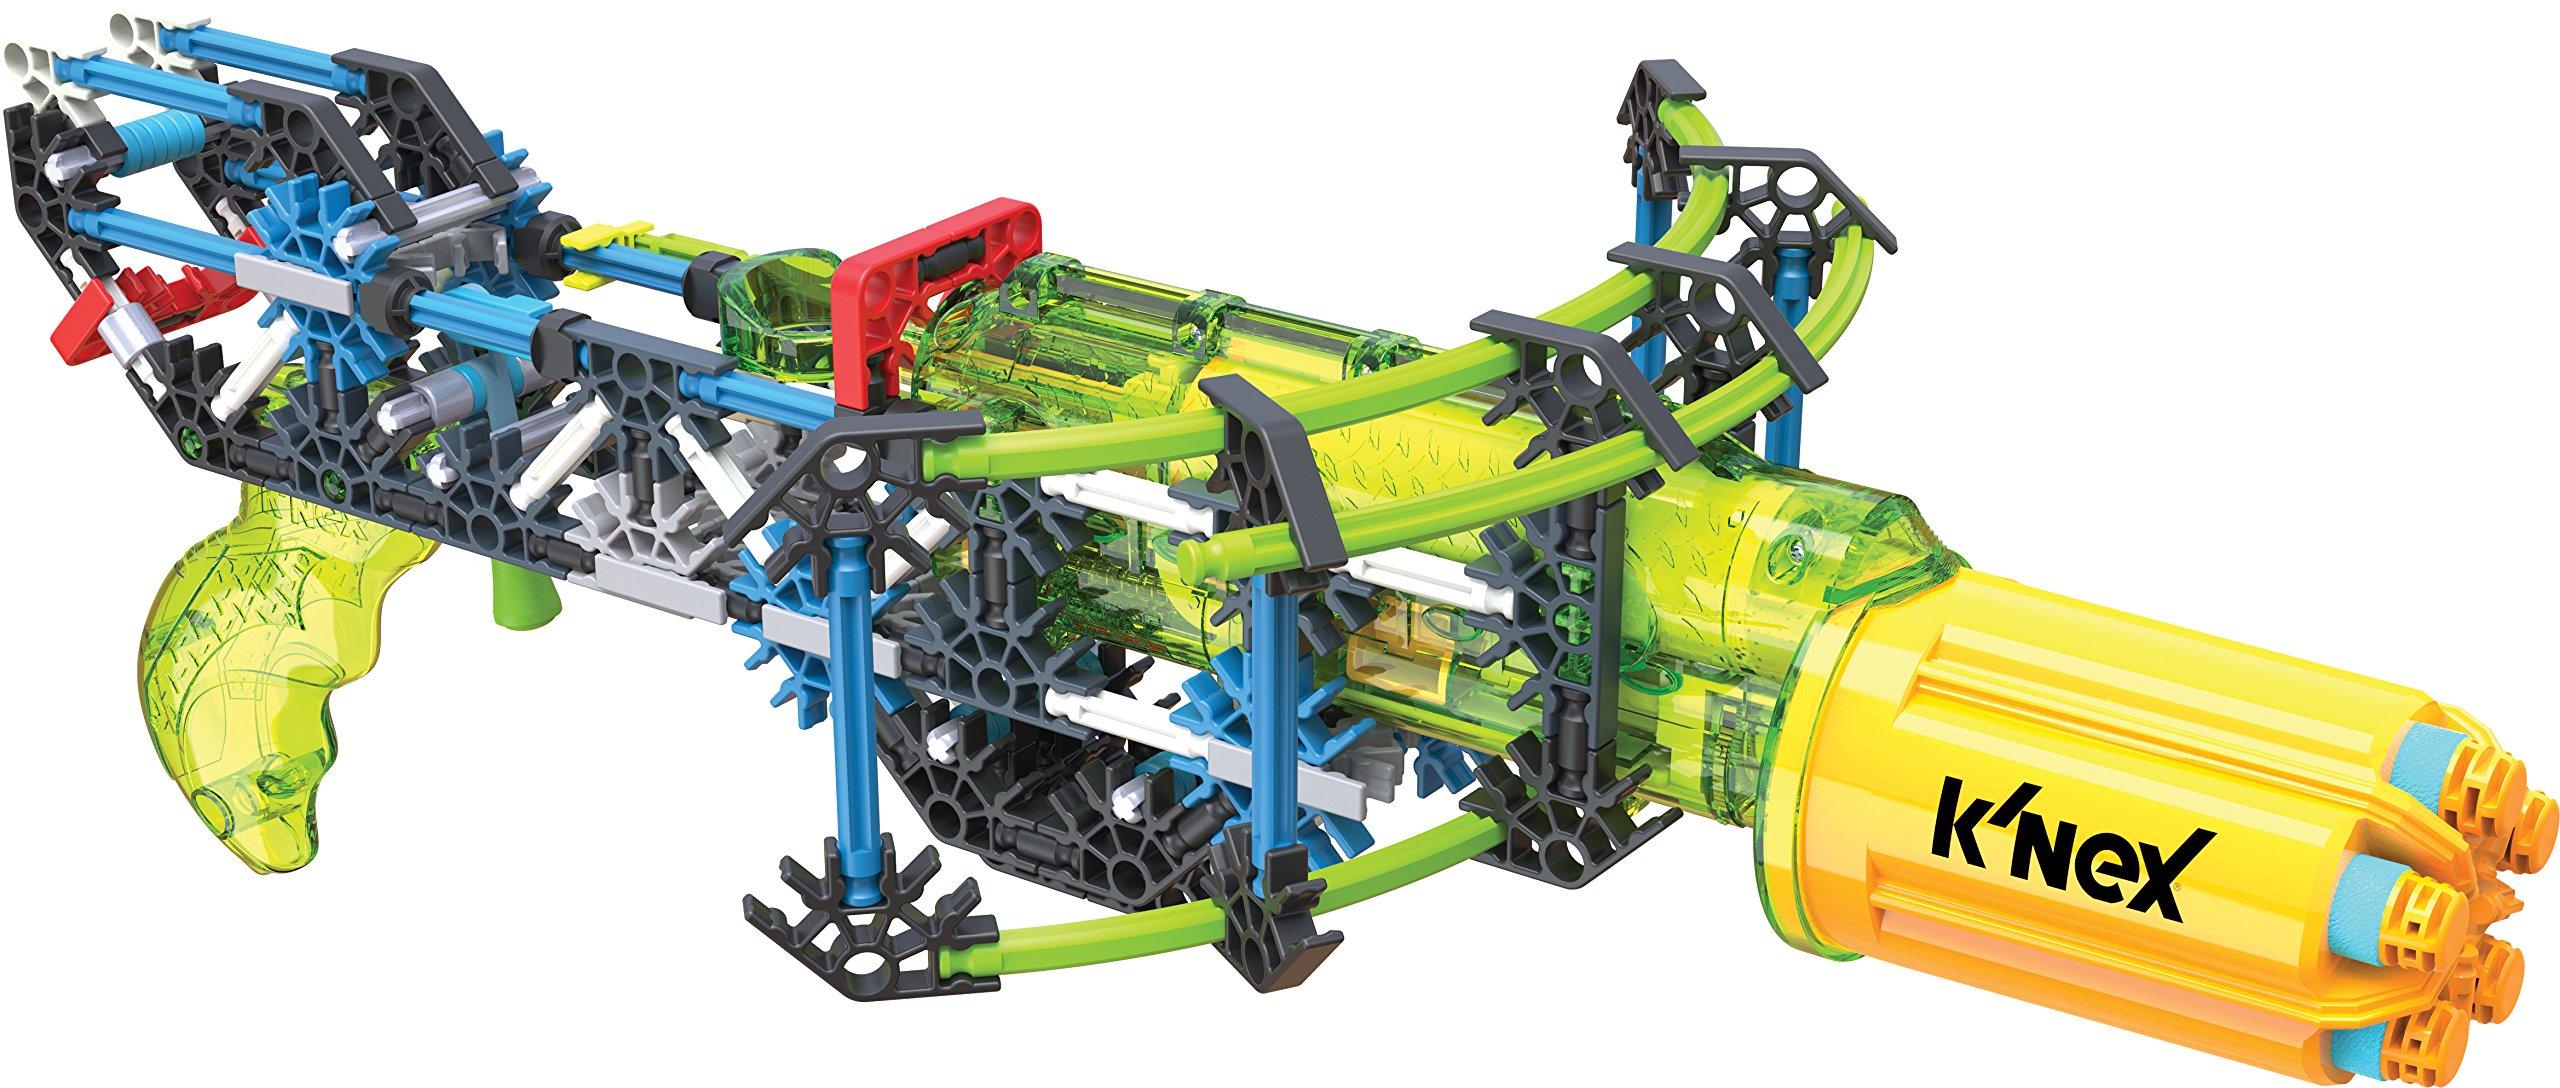 K'NEX K-FORCE – Super Strike RotoShot Blaster Building Set – 201 Pieces –  Ages 8+ Engineering Education Toy